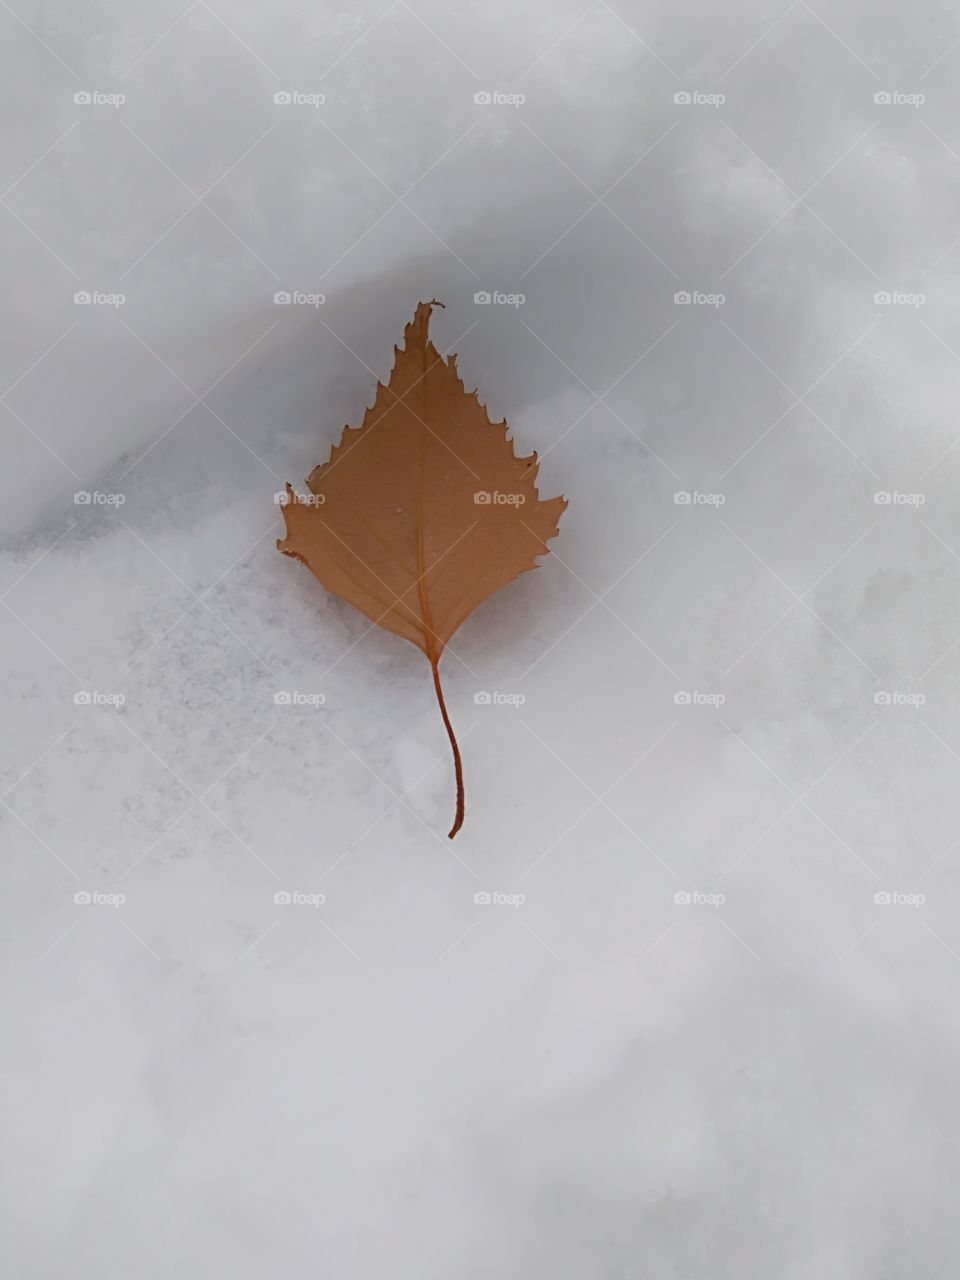 brown dead leaf